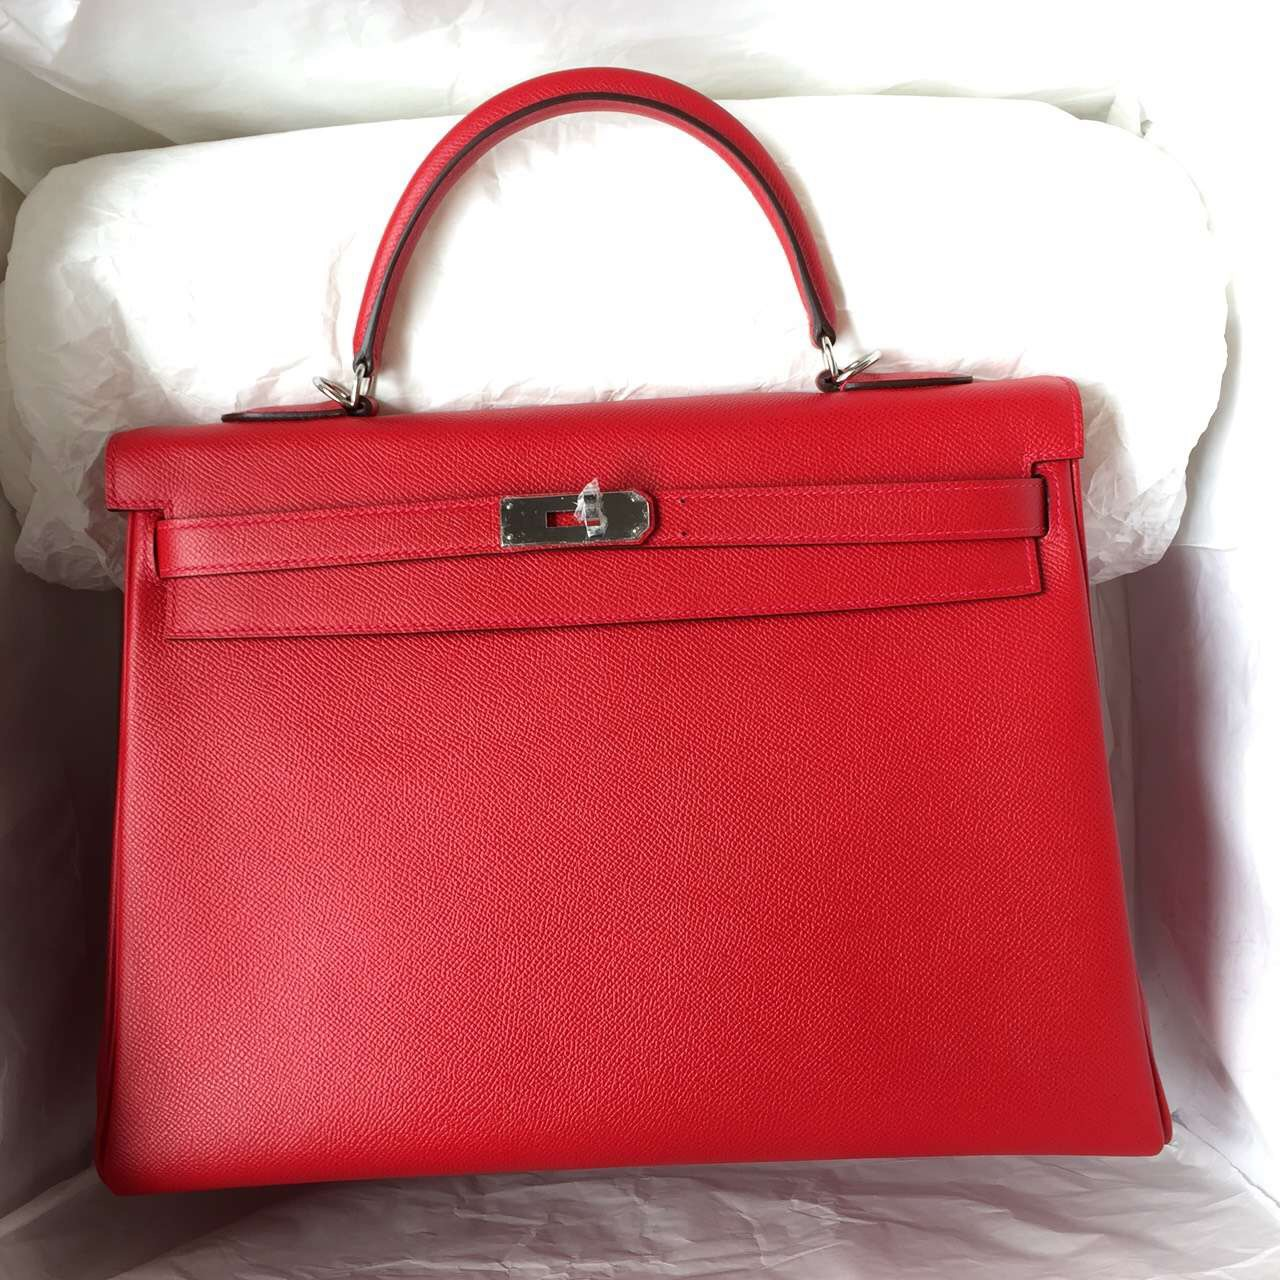 Cheap Hermes Q5 Chinese Red Kelly Bag 35cm Retourne Epsom Leather Tote Bag